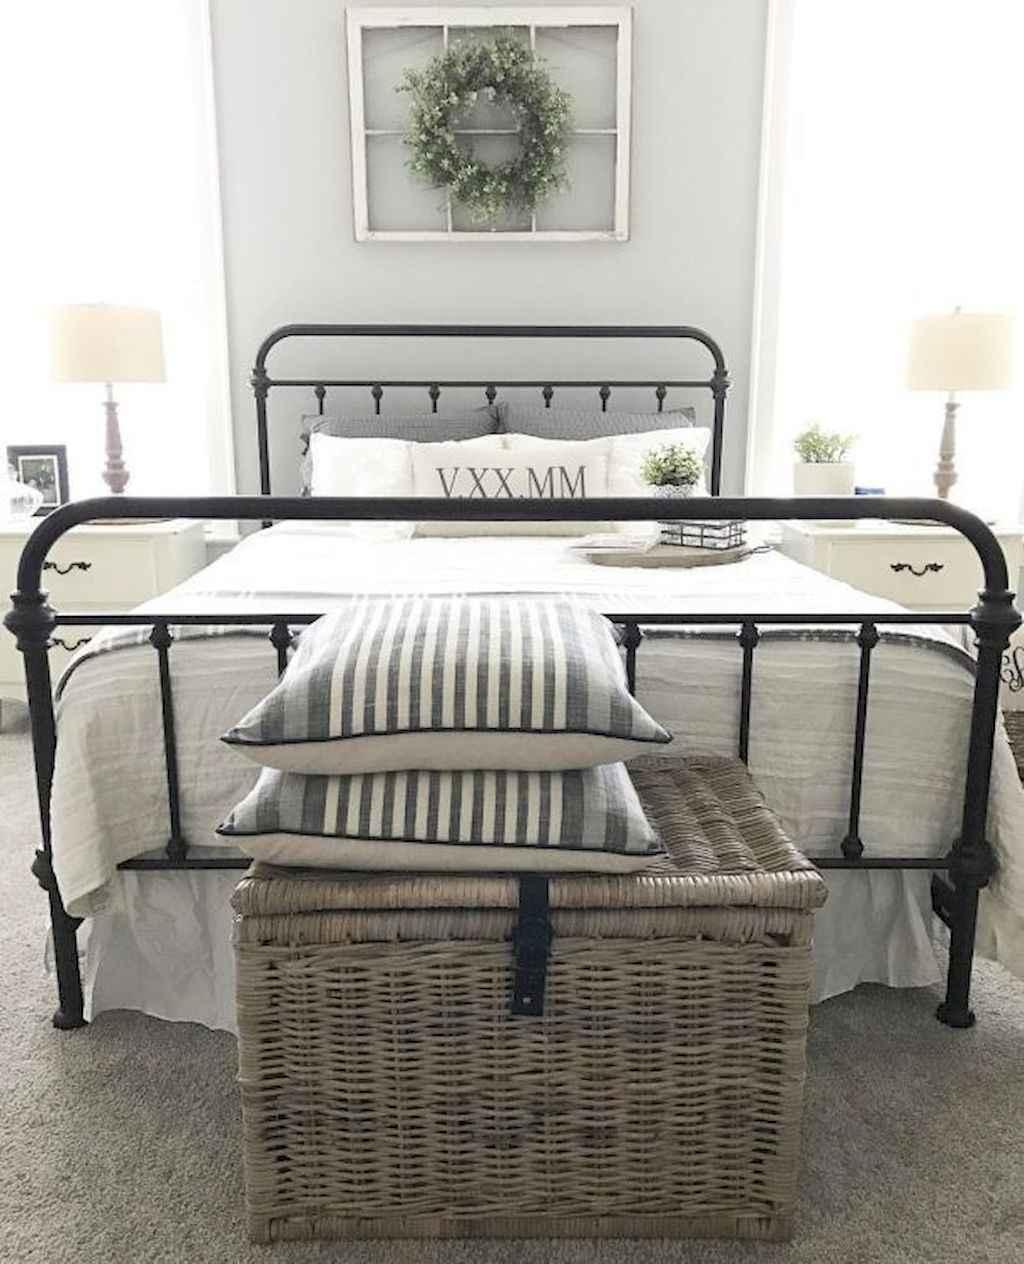 Incredible master bedroom ideas (21)